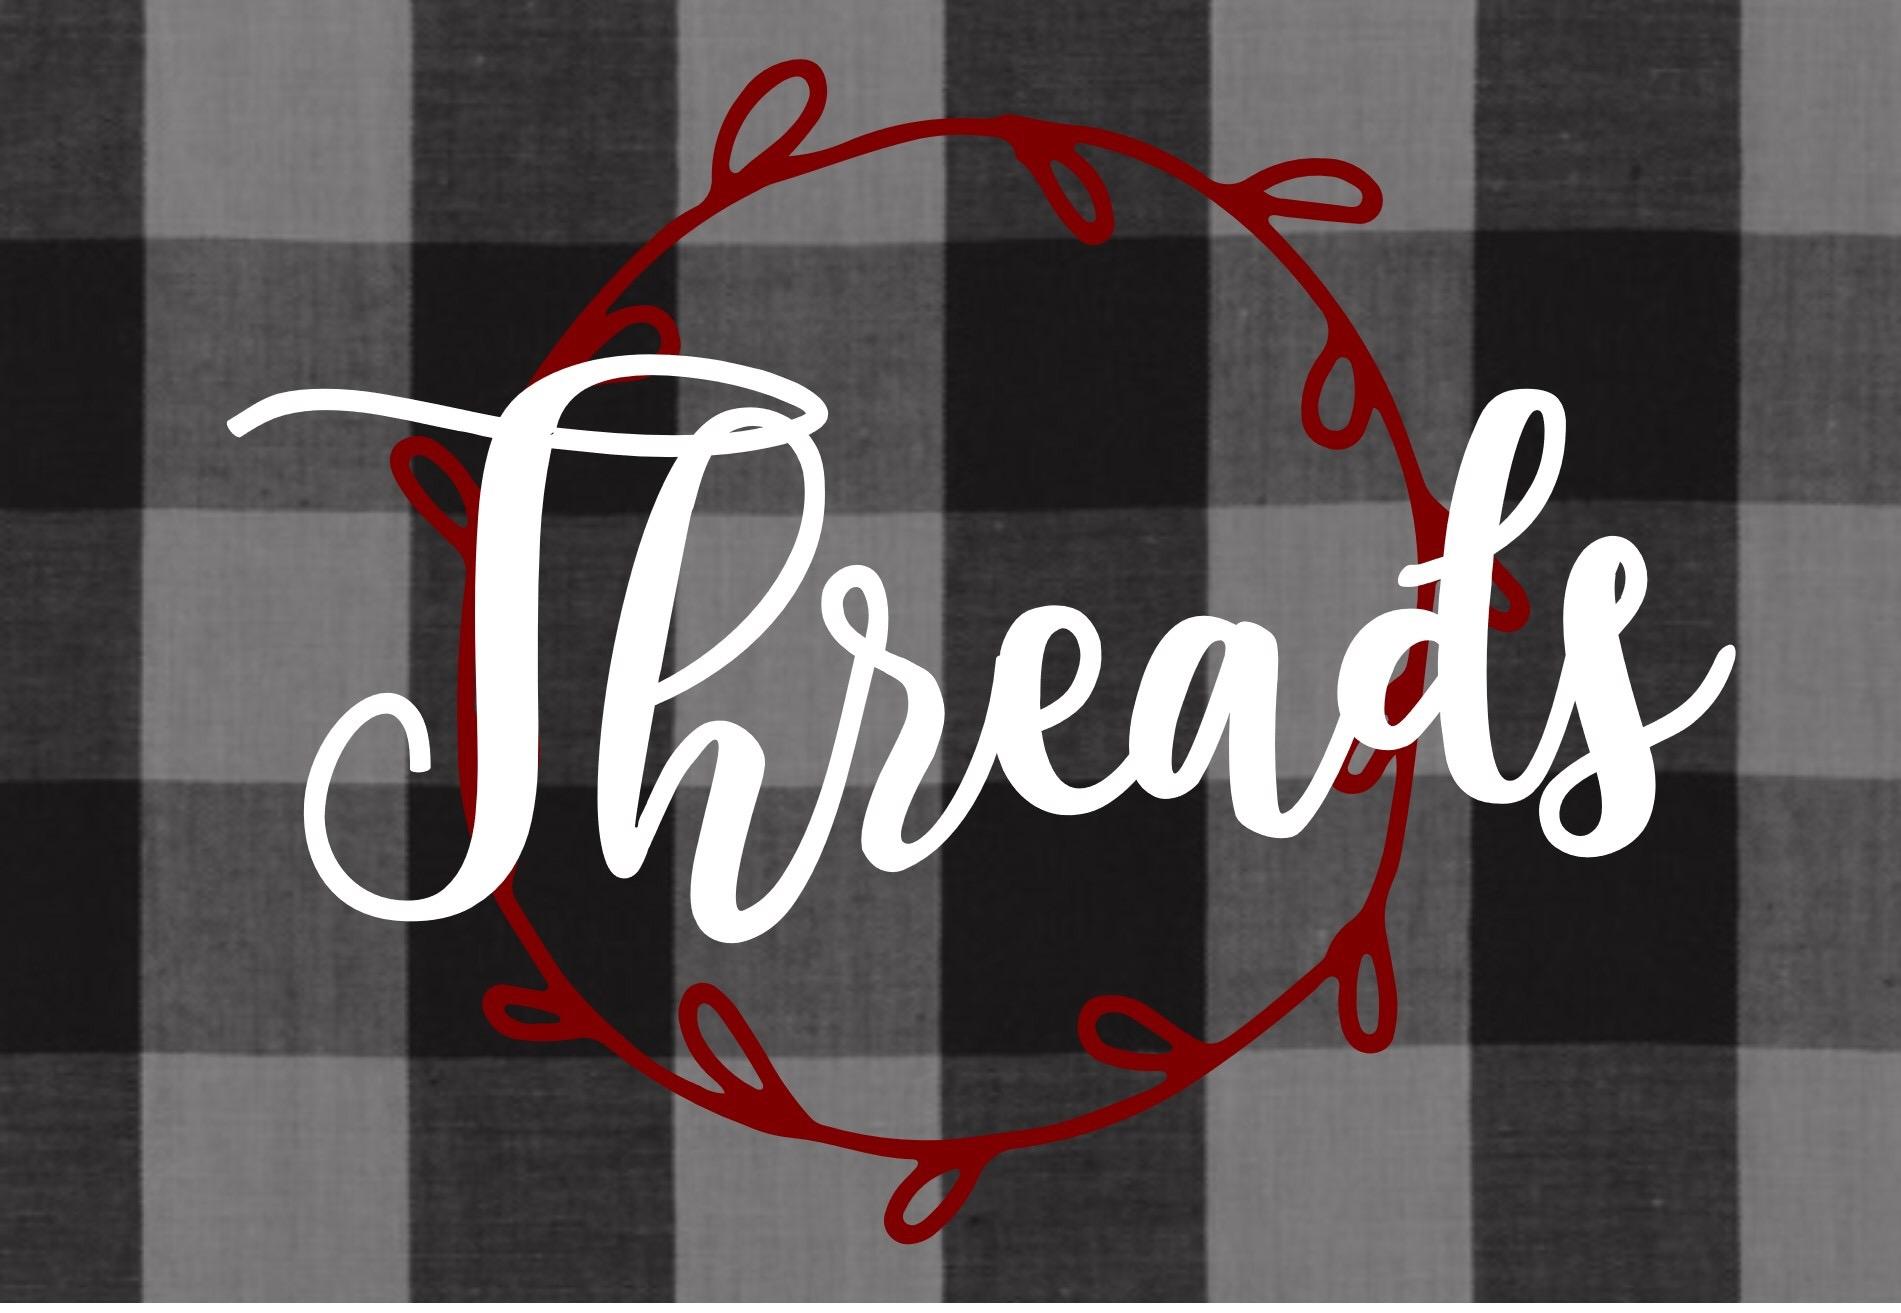 threads image.JPG